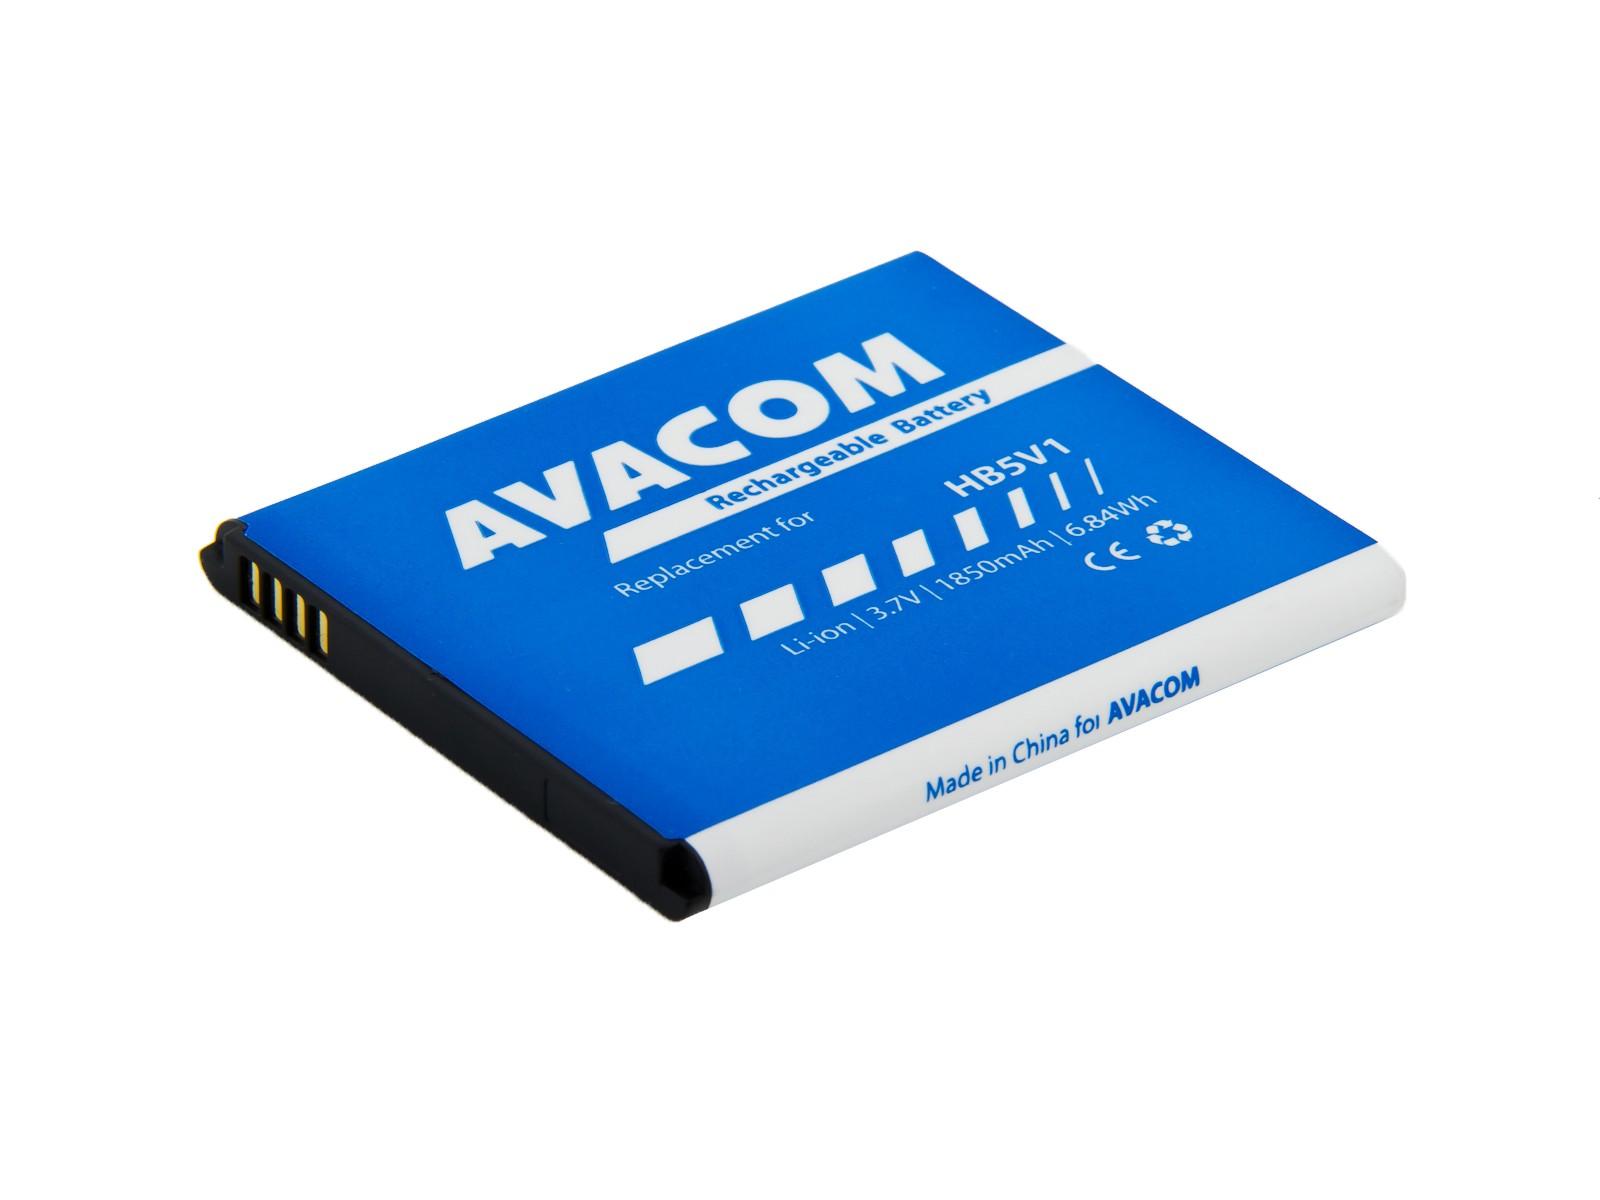 Baterie AVACOM GSHU-HB5V1-2100 do mobilu Huawei Ascend Y300 Li-Ion 3,7V 1850mAh, (náhrada HB5V1)